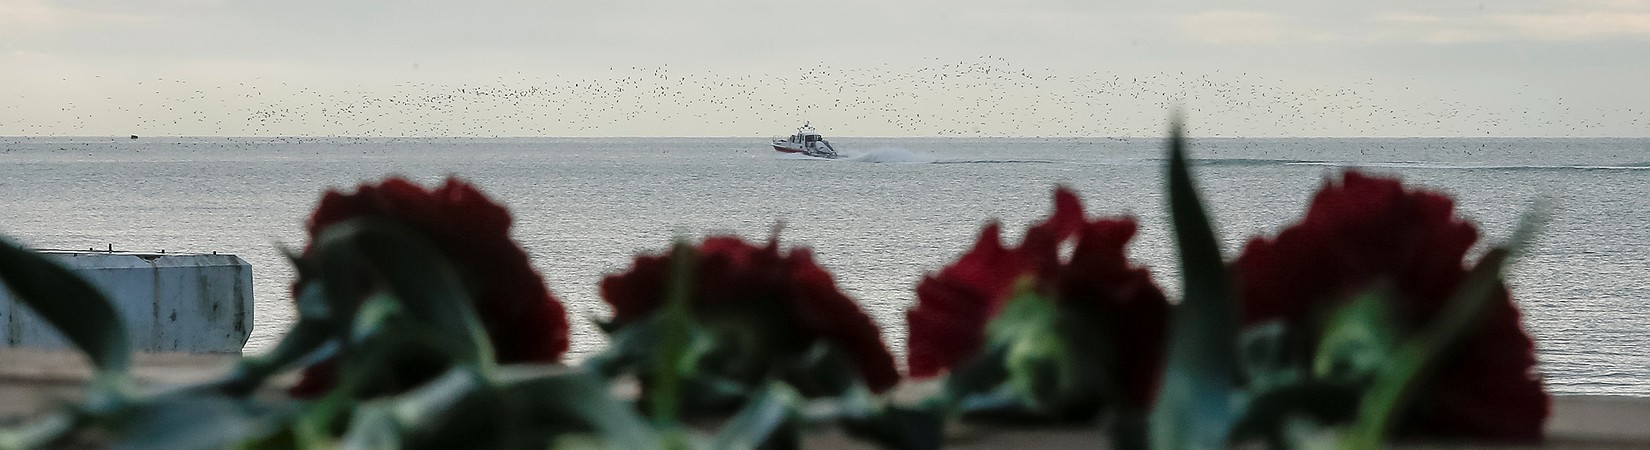 Localizan una caja negra del avión ruso que se estrelló en el mar Negro